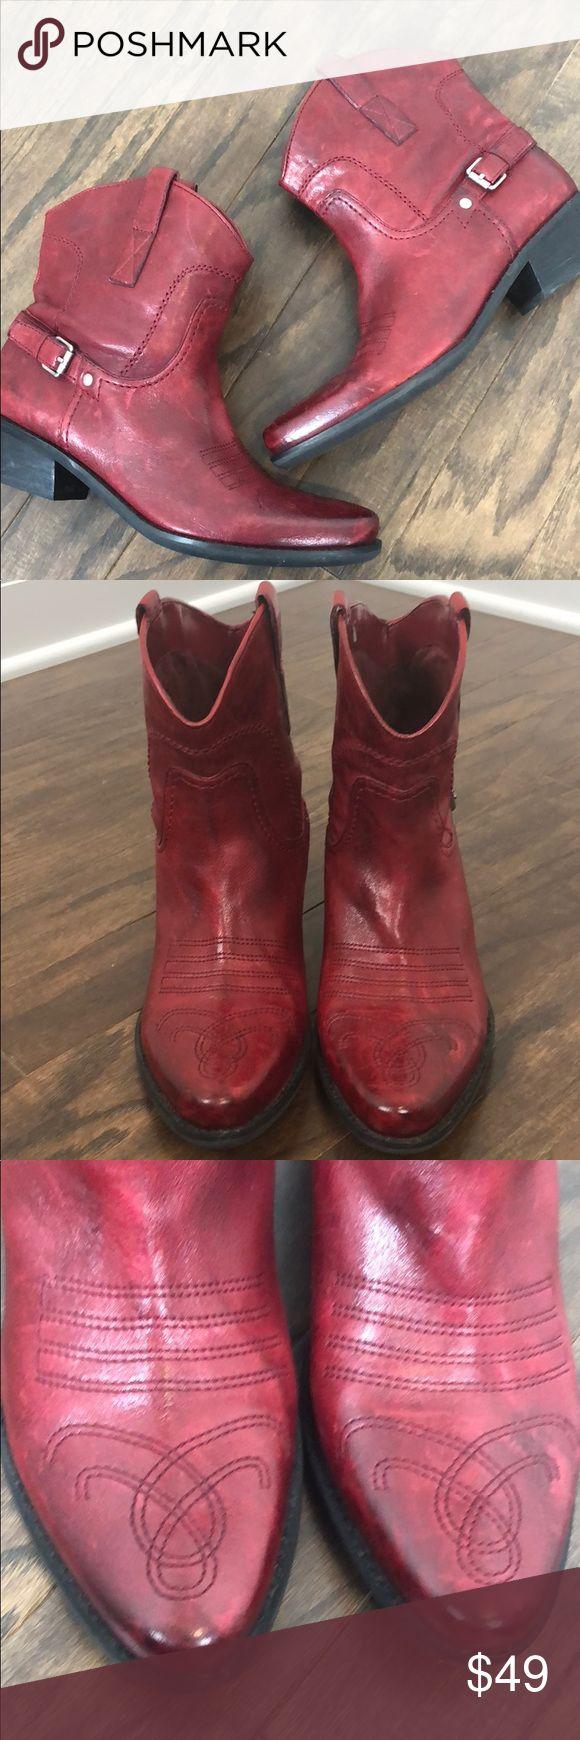 2ffcadad102 Franco Sarto Leather Waco Boots Amazing Genuine Leather Fra